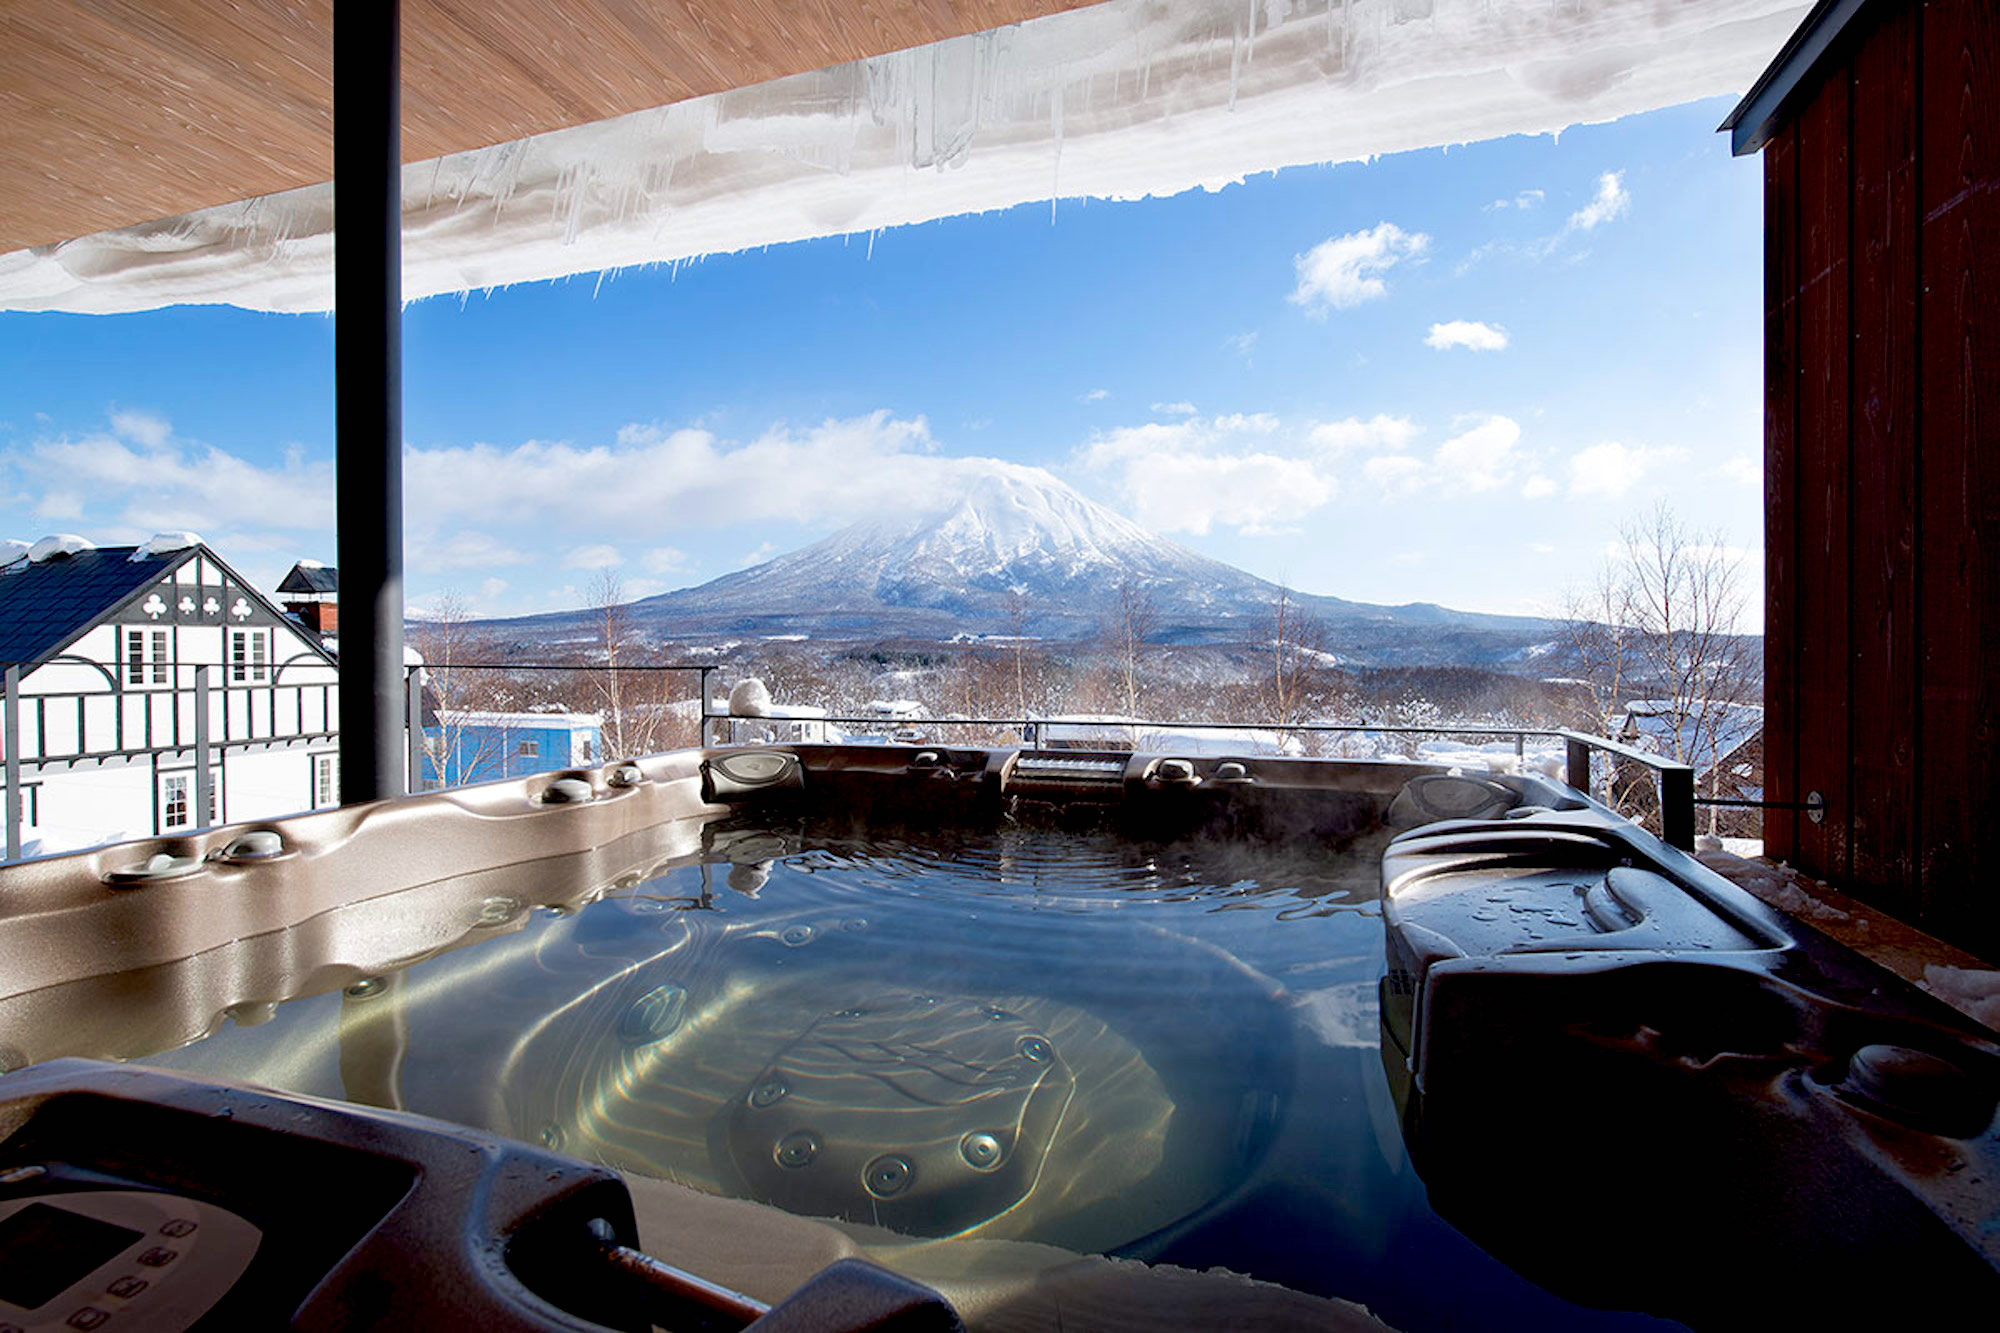 10 Most Extravagant Luxury Chalets in Niseko